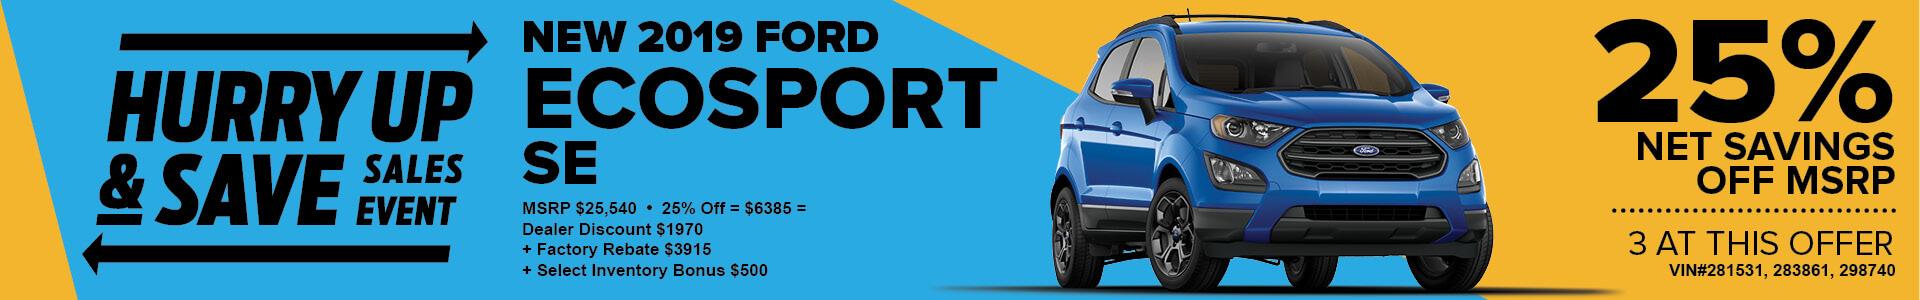 MJS ad - 2019 Ecosport